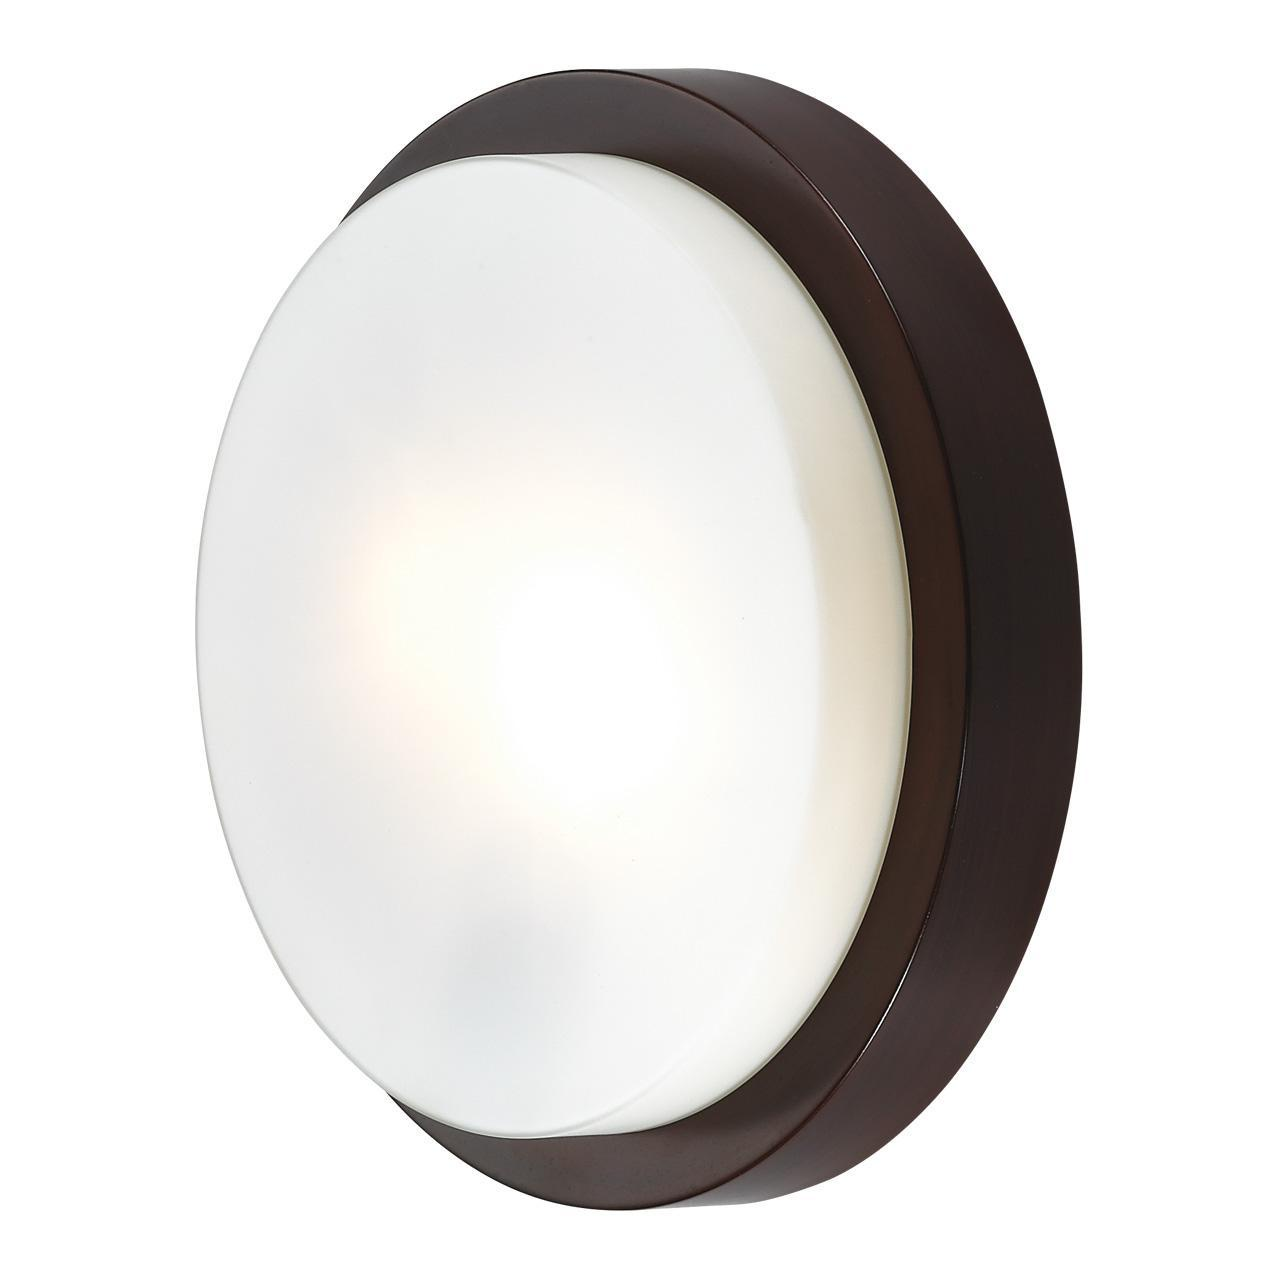 Светильник Odeon Light 2744/2C потолочный светильник odeon light holger 2744 3c